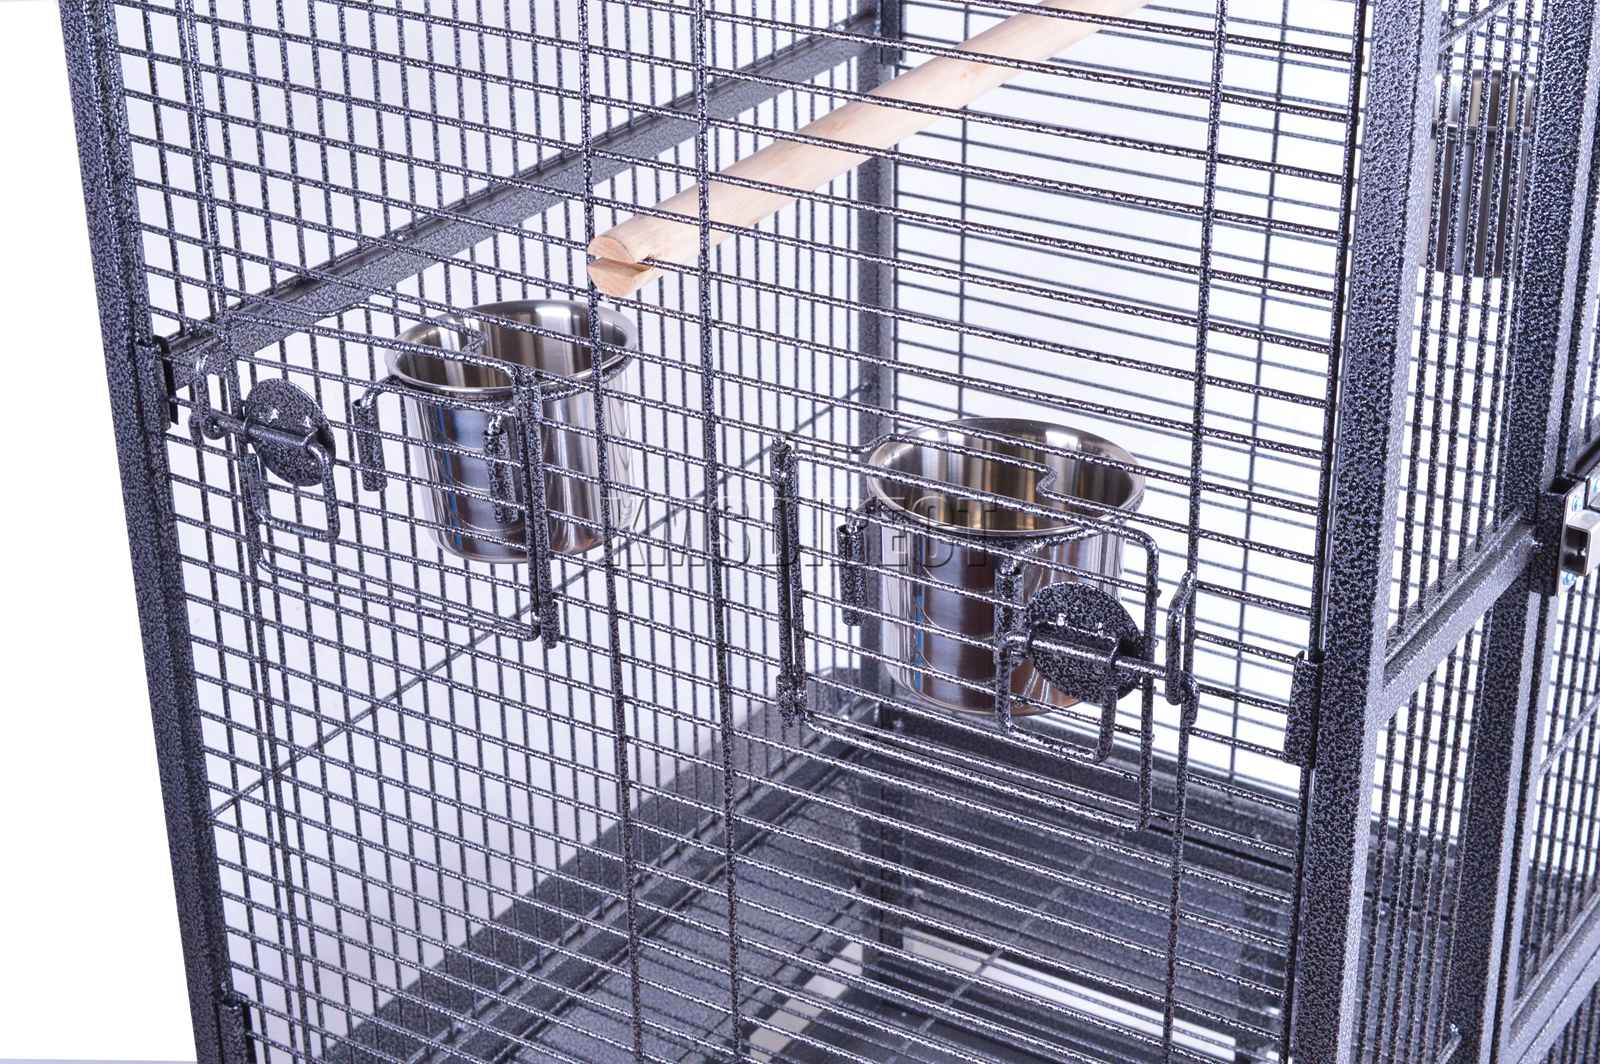 121998112507 2475 I 225 38 BIRD CAGE METAL MBC 04 HAMMERED SILVER KMSWM0606 - Foxhunter Grande Metal Jaula con Soporte Pajarera Loro Periquito Canario Cacatua